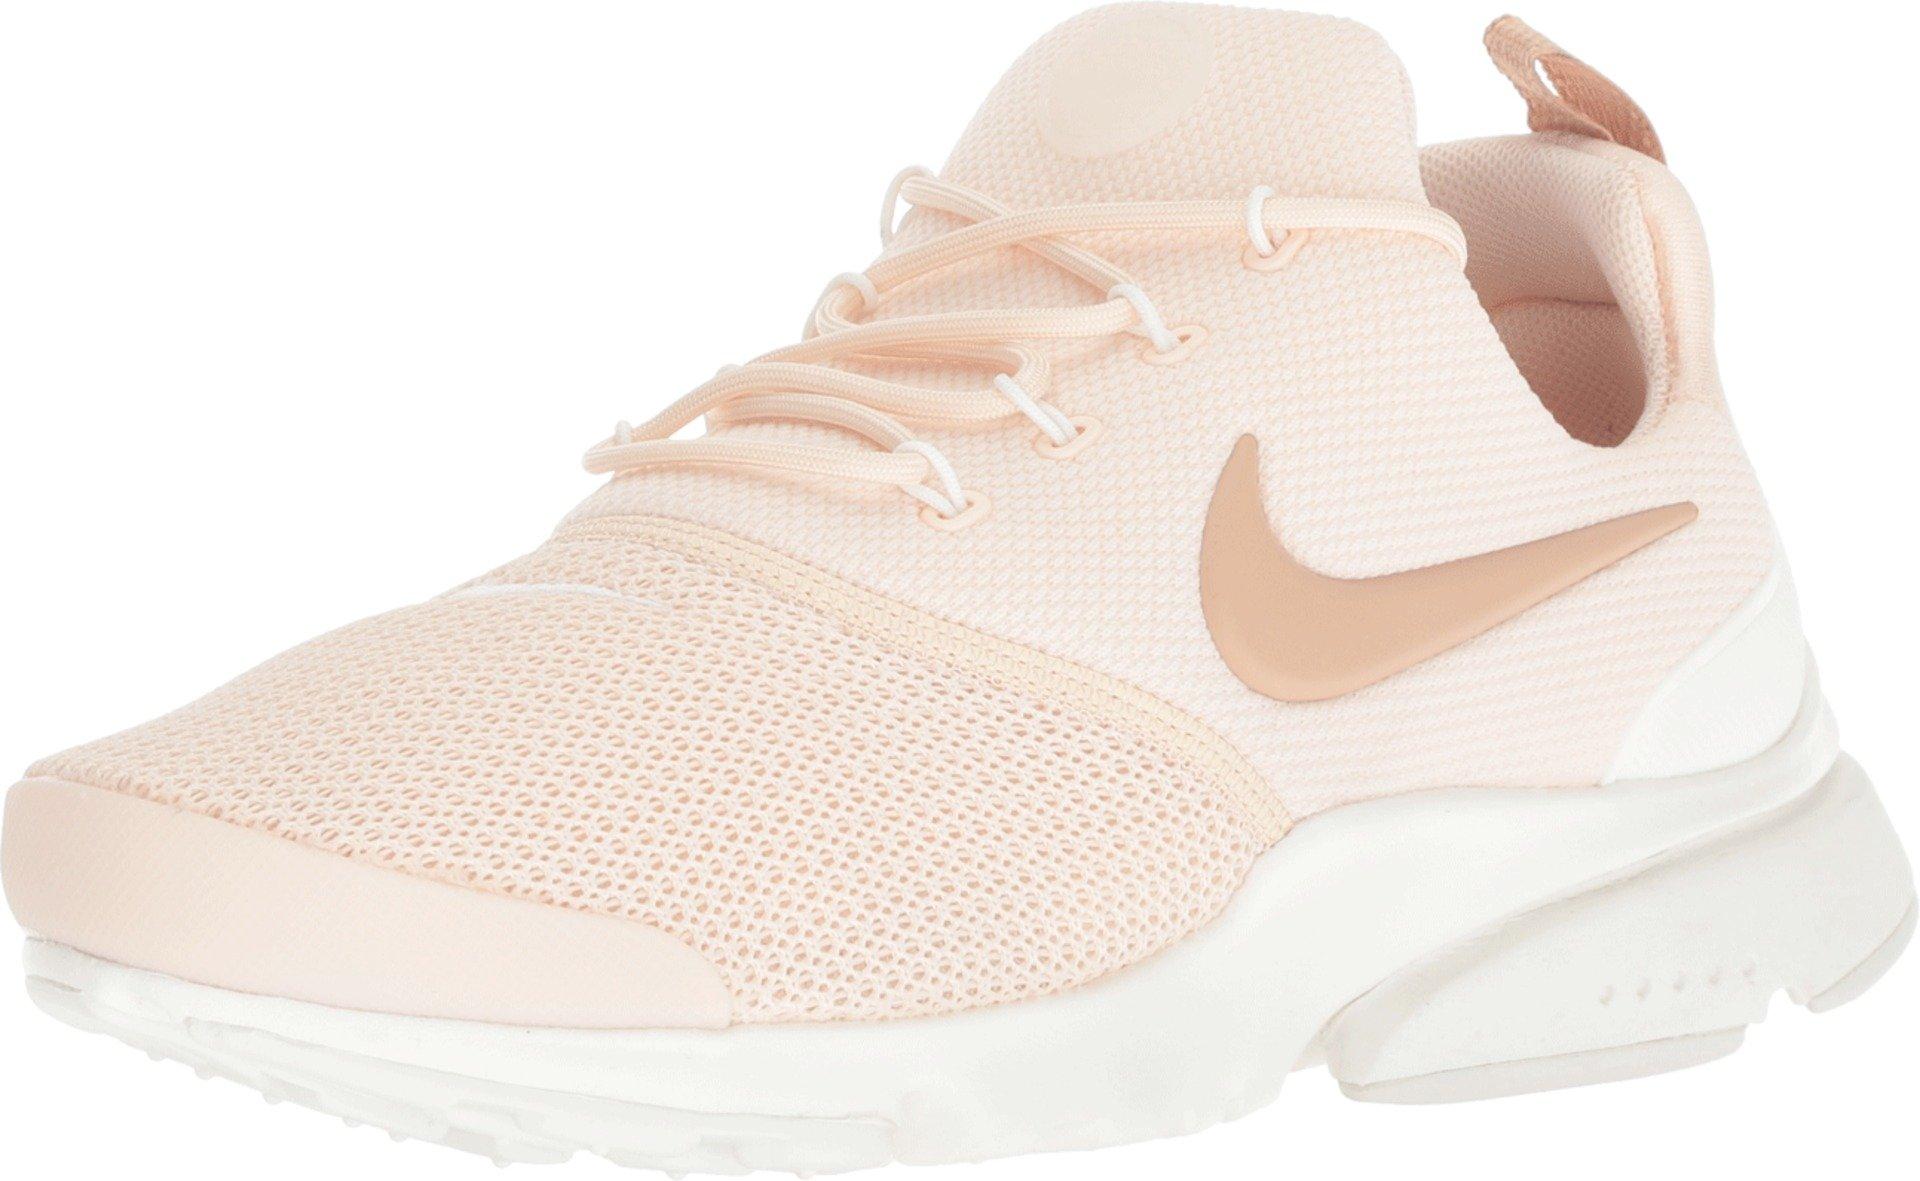 906484ec394c Galleon - Nike WMNS Presto Fly Womens 910569-800 Size 11